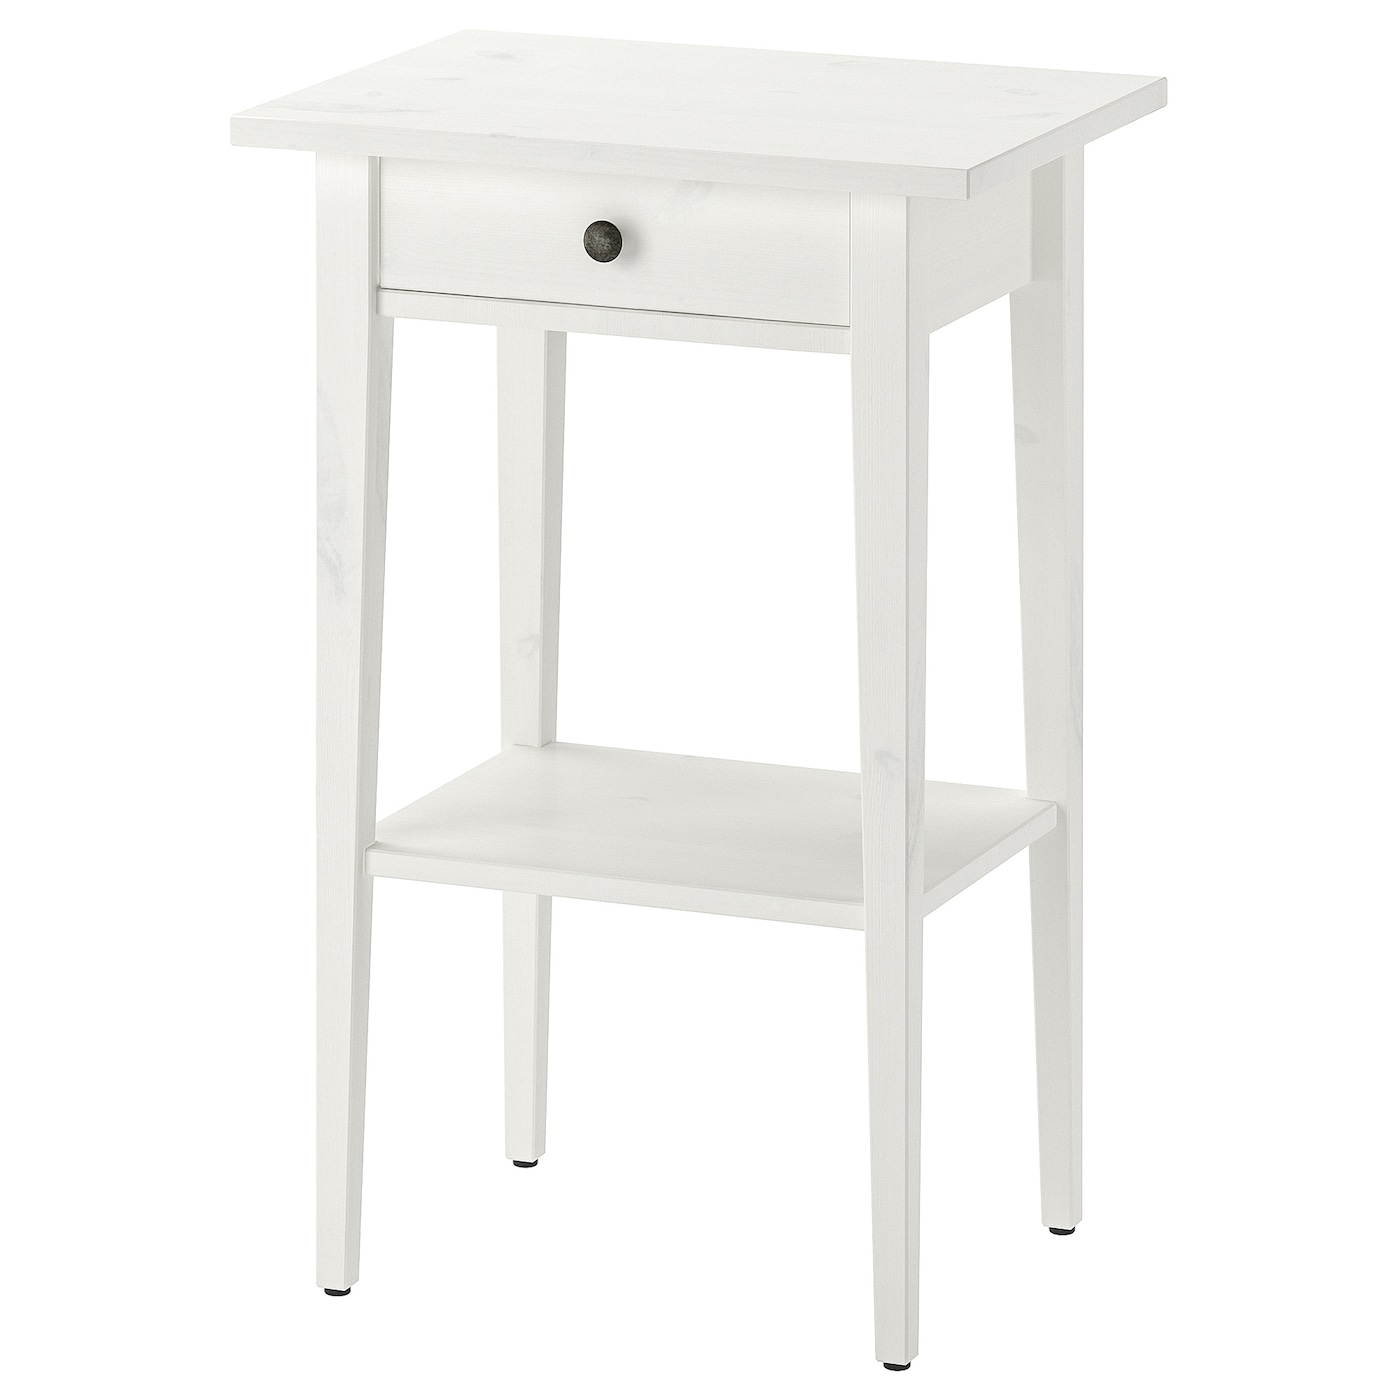 Hemnes White Stain Bedside Table